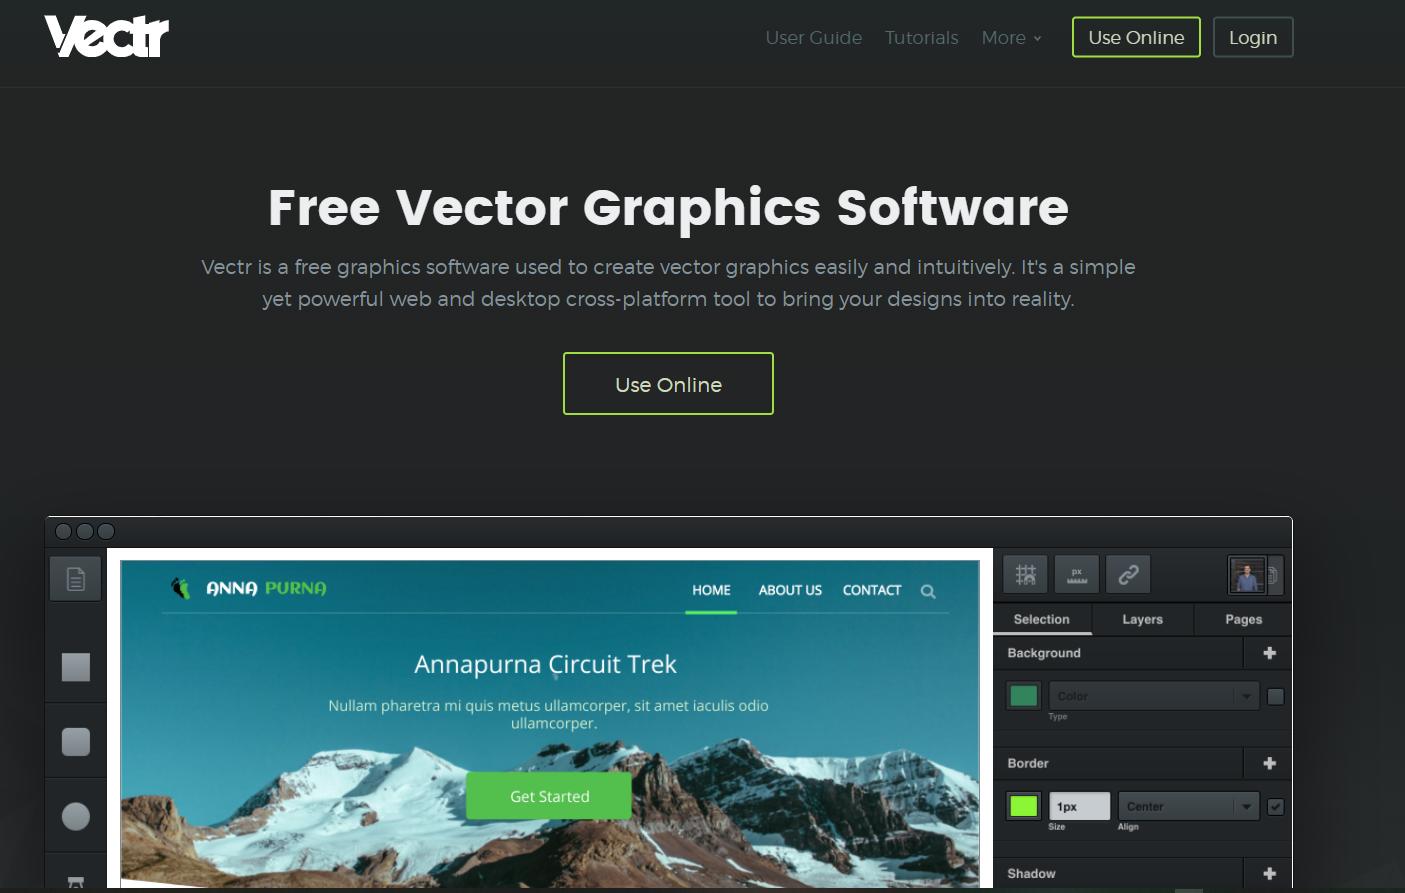 webdesign-resources